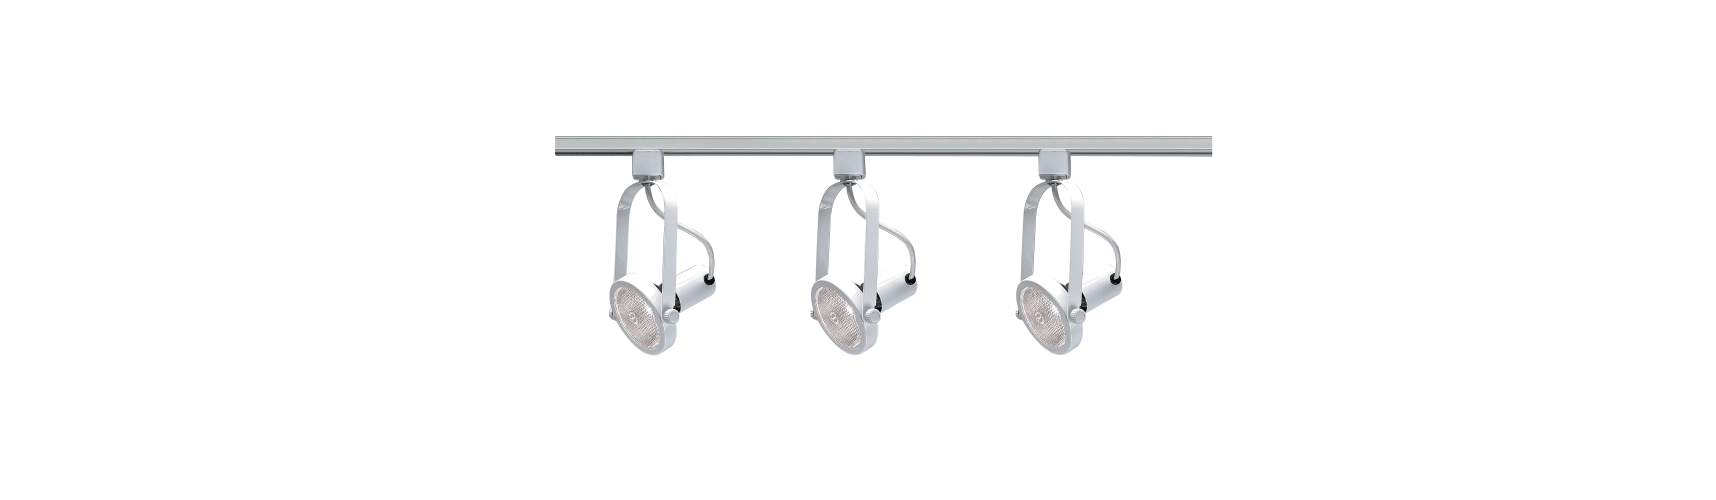 Nuvo Lighting TK316 White Track Lighting Three Light PAR30 Gimbal Ring Track Kit in White Finish